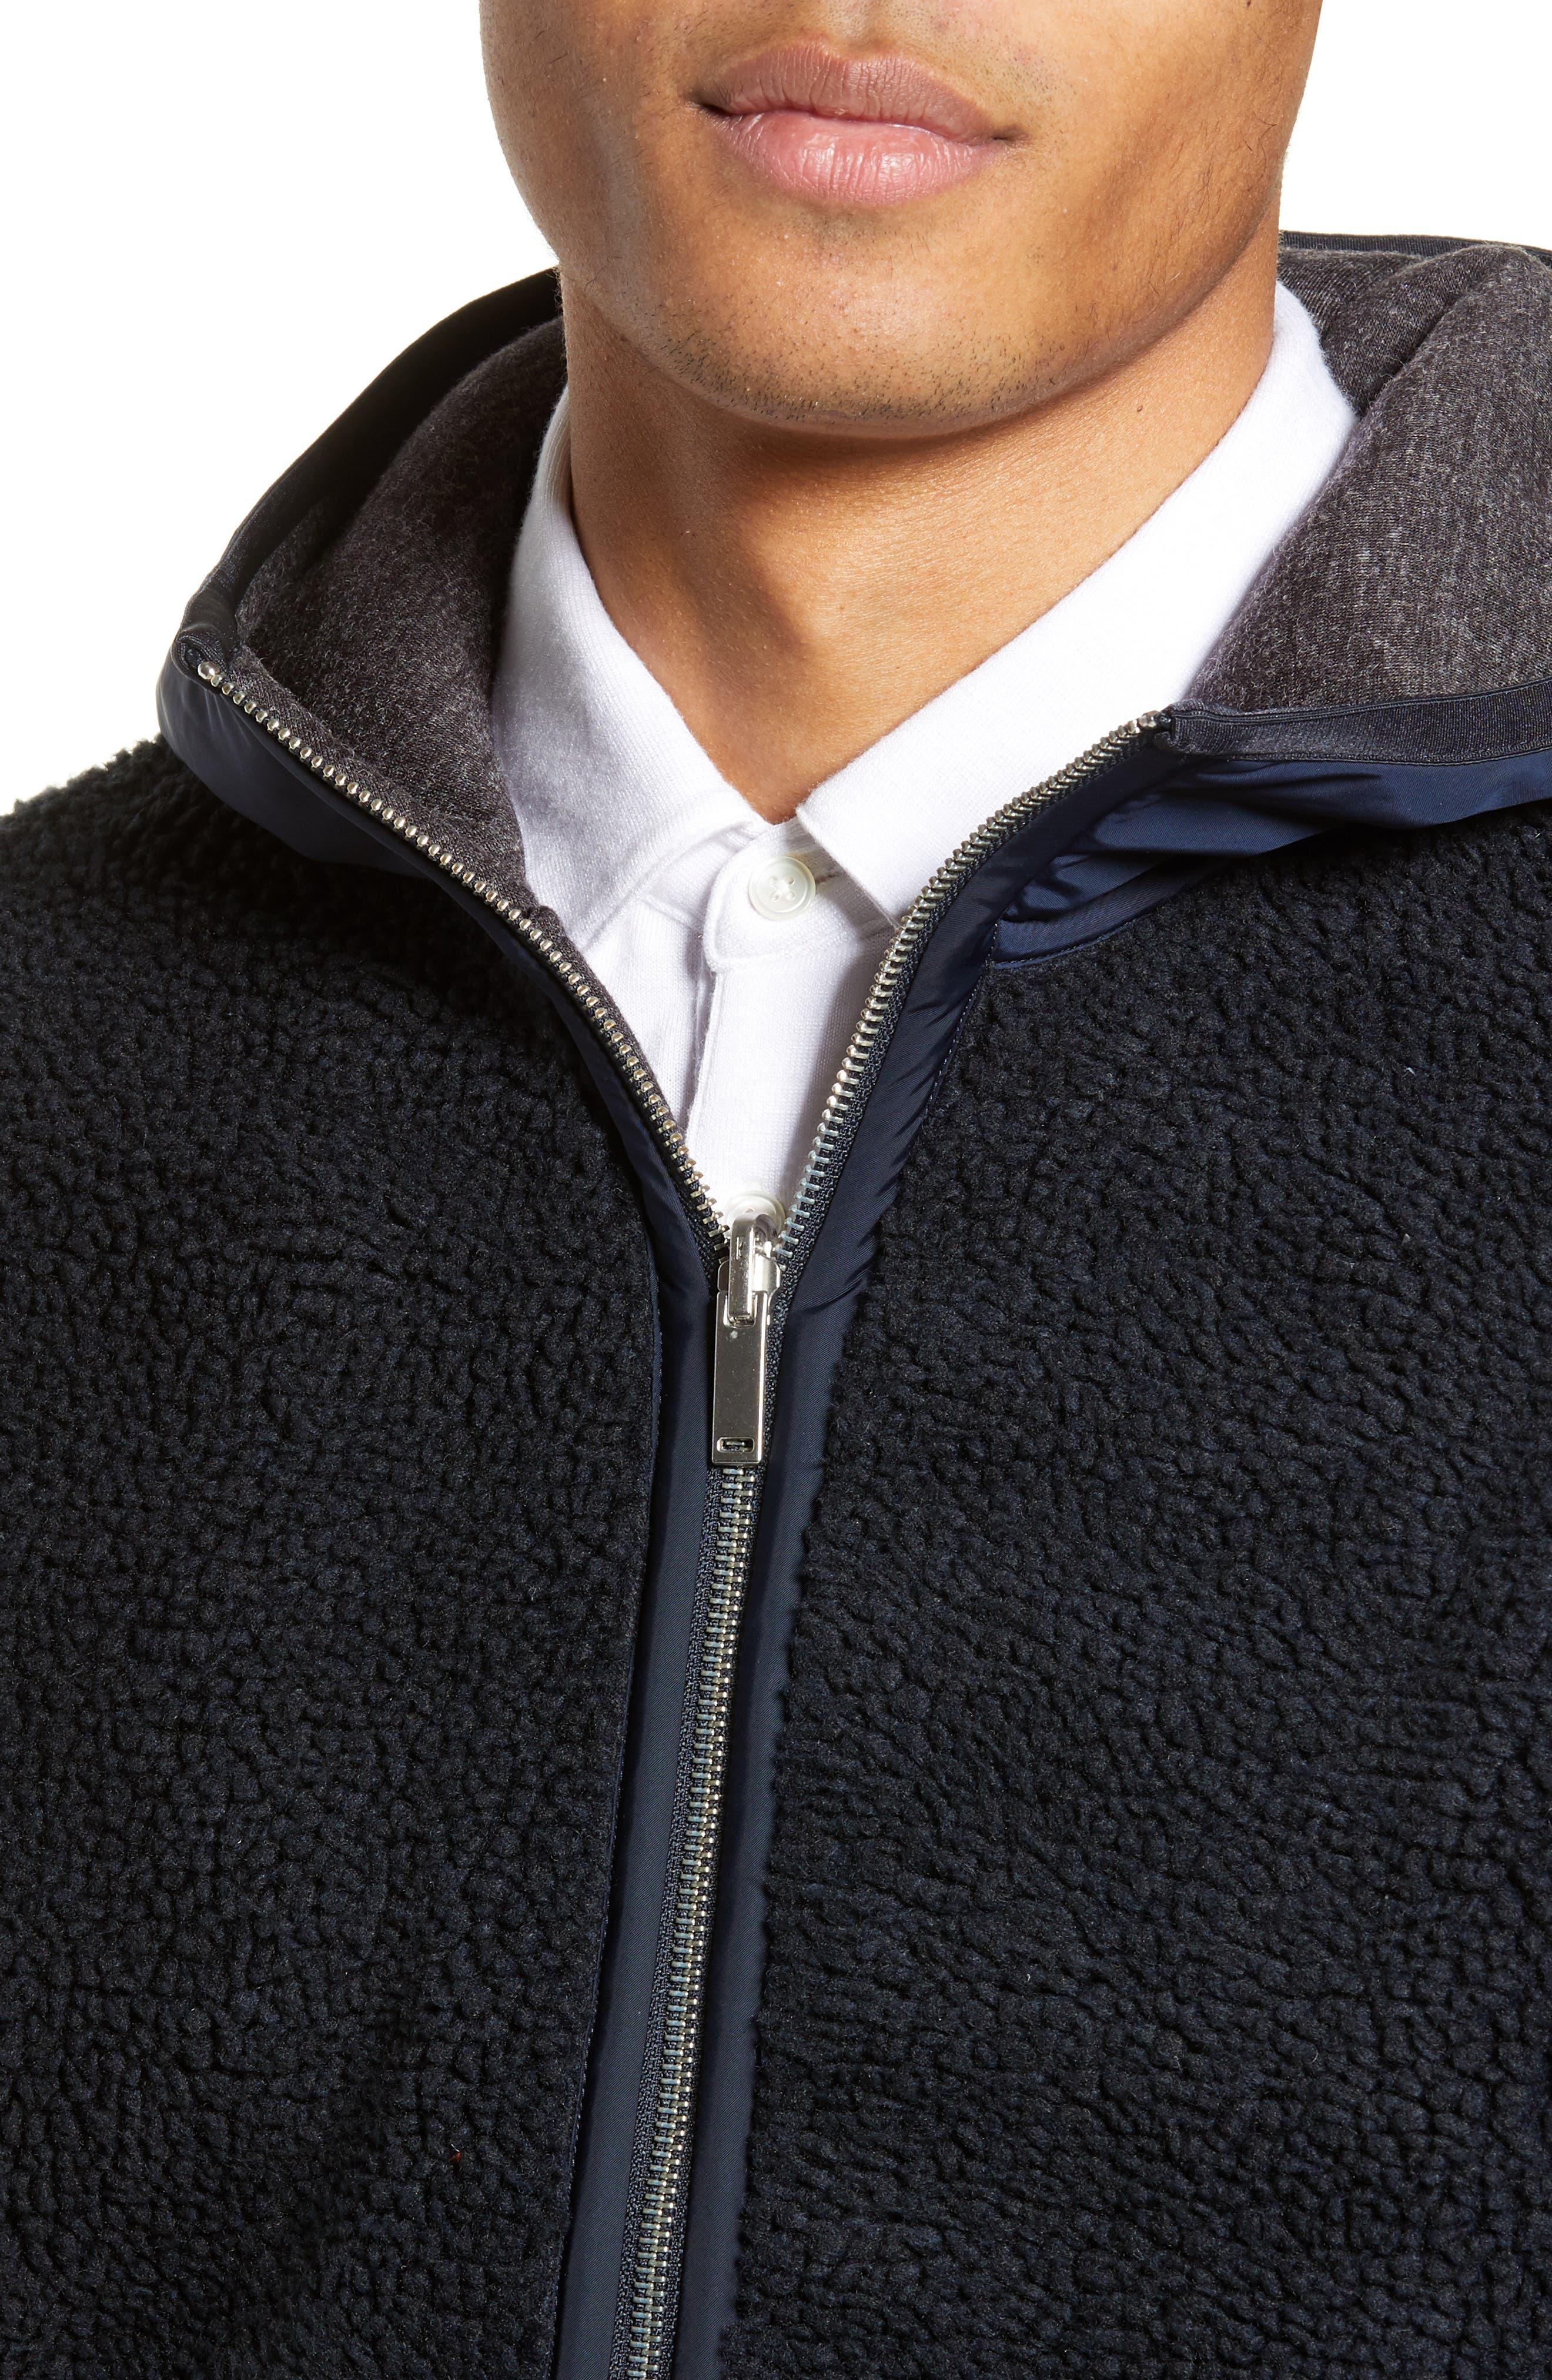 THEORY, Polar Fleece Reversible Zip Hoodie, Alternate thumbnail 6, color, 476